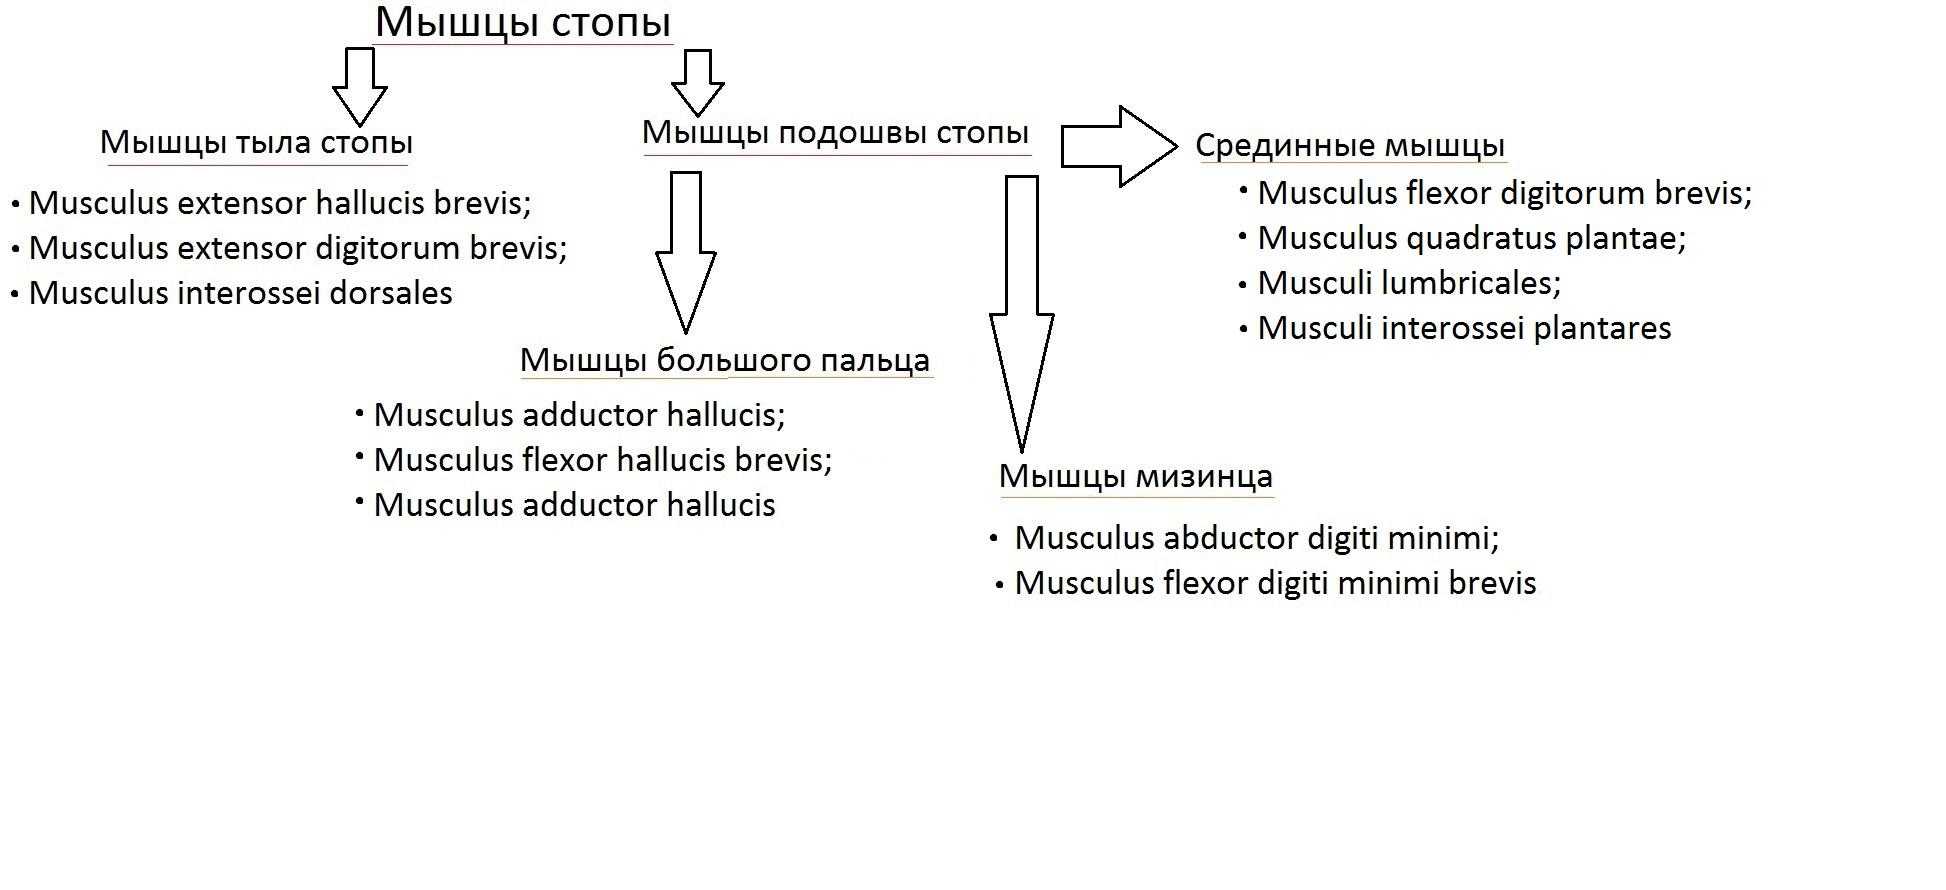 klassificatia_myshc_stopy7